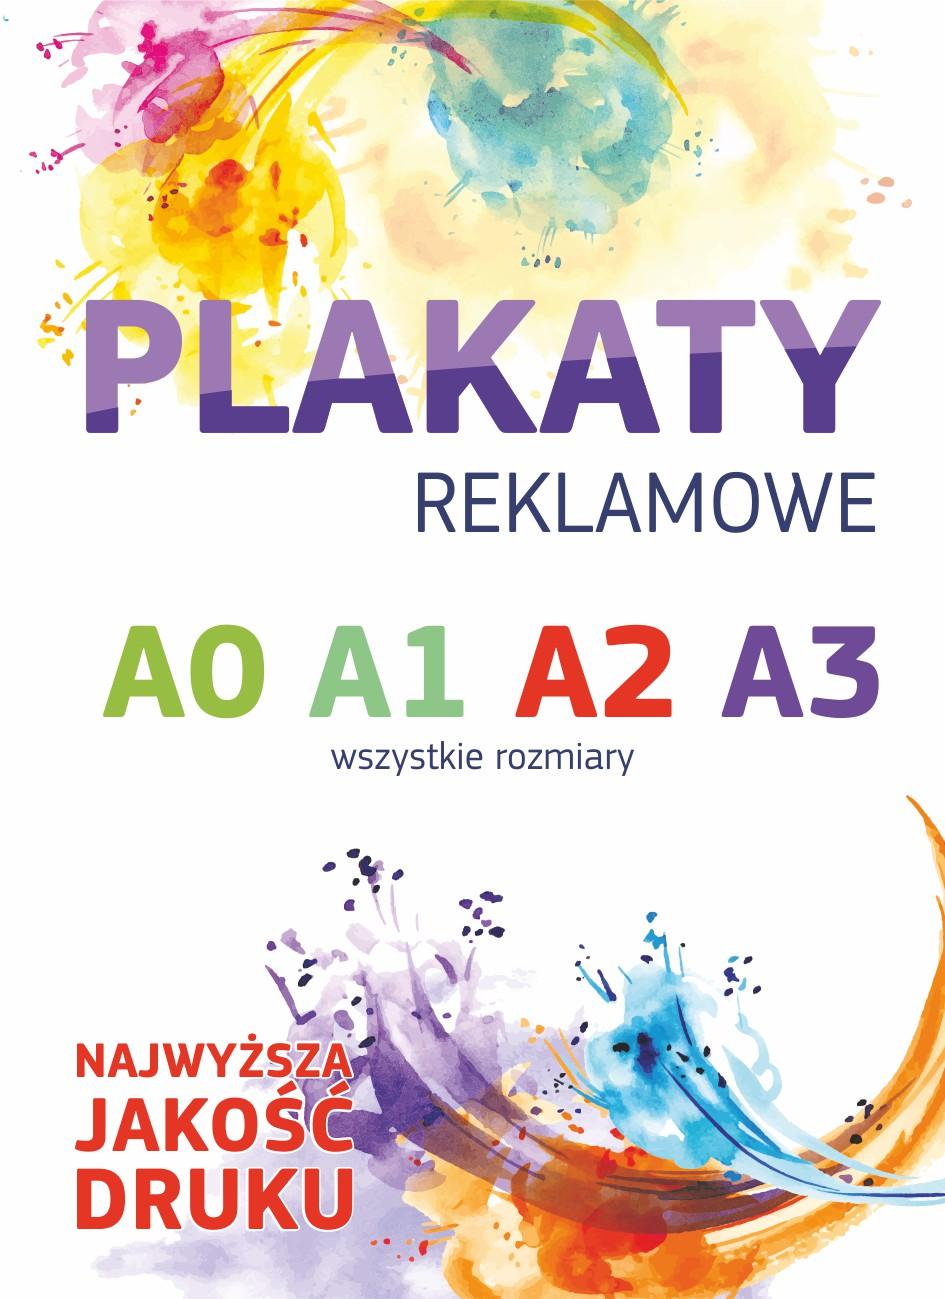 Plakaty Reklamowe A3 A2 A1 A0 Dowolny Rozmiar